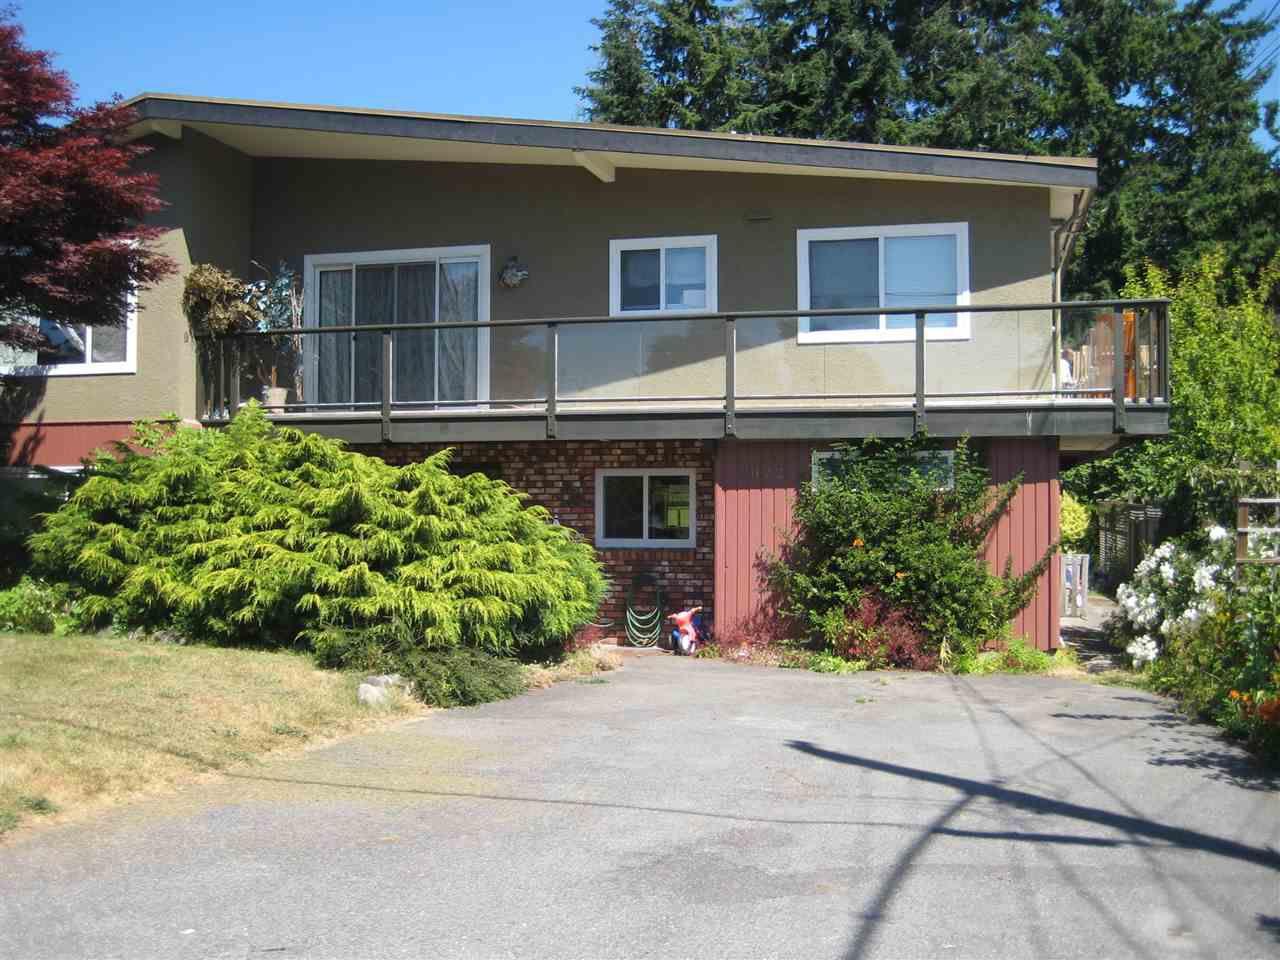 Main Photo: 1072 HABGOOD Street: White Rock House for sale (South Surrey White Rock)  : MLS®# R2188473